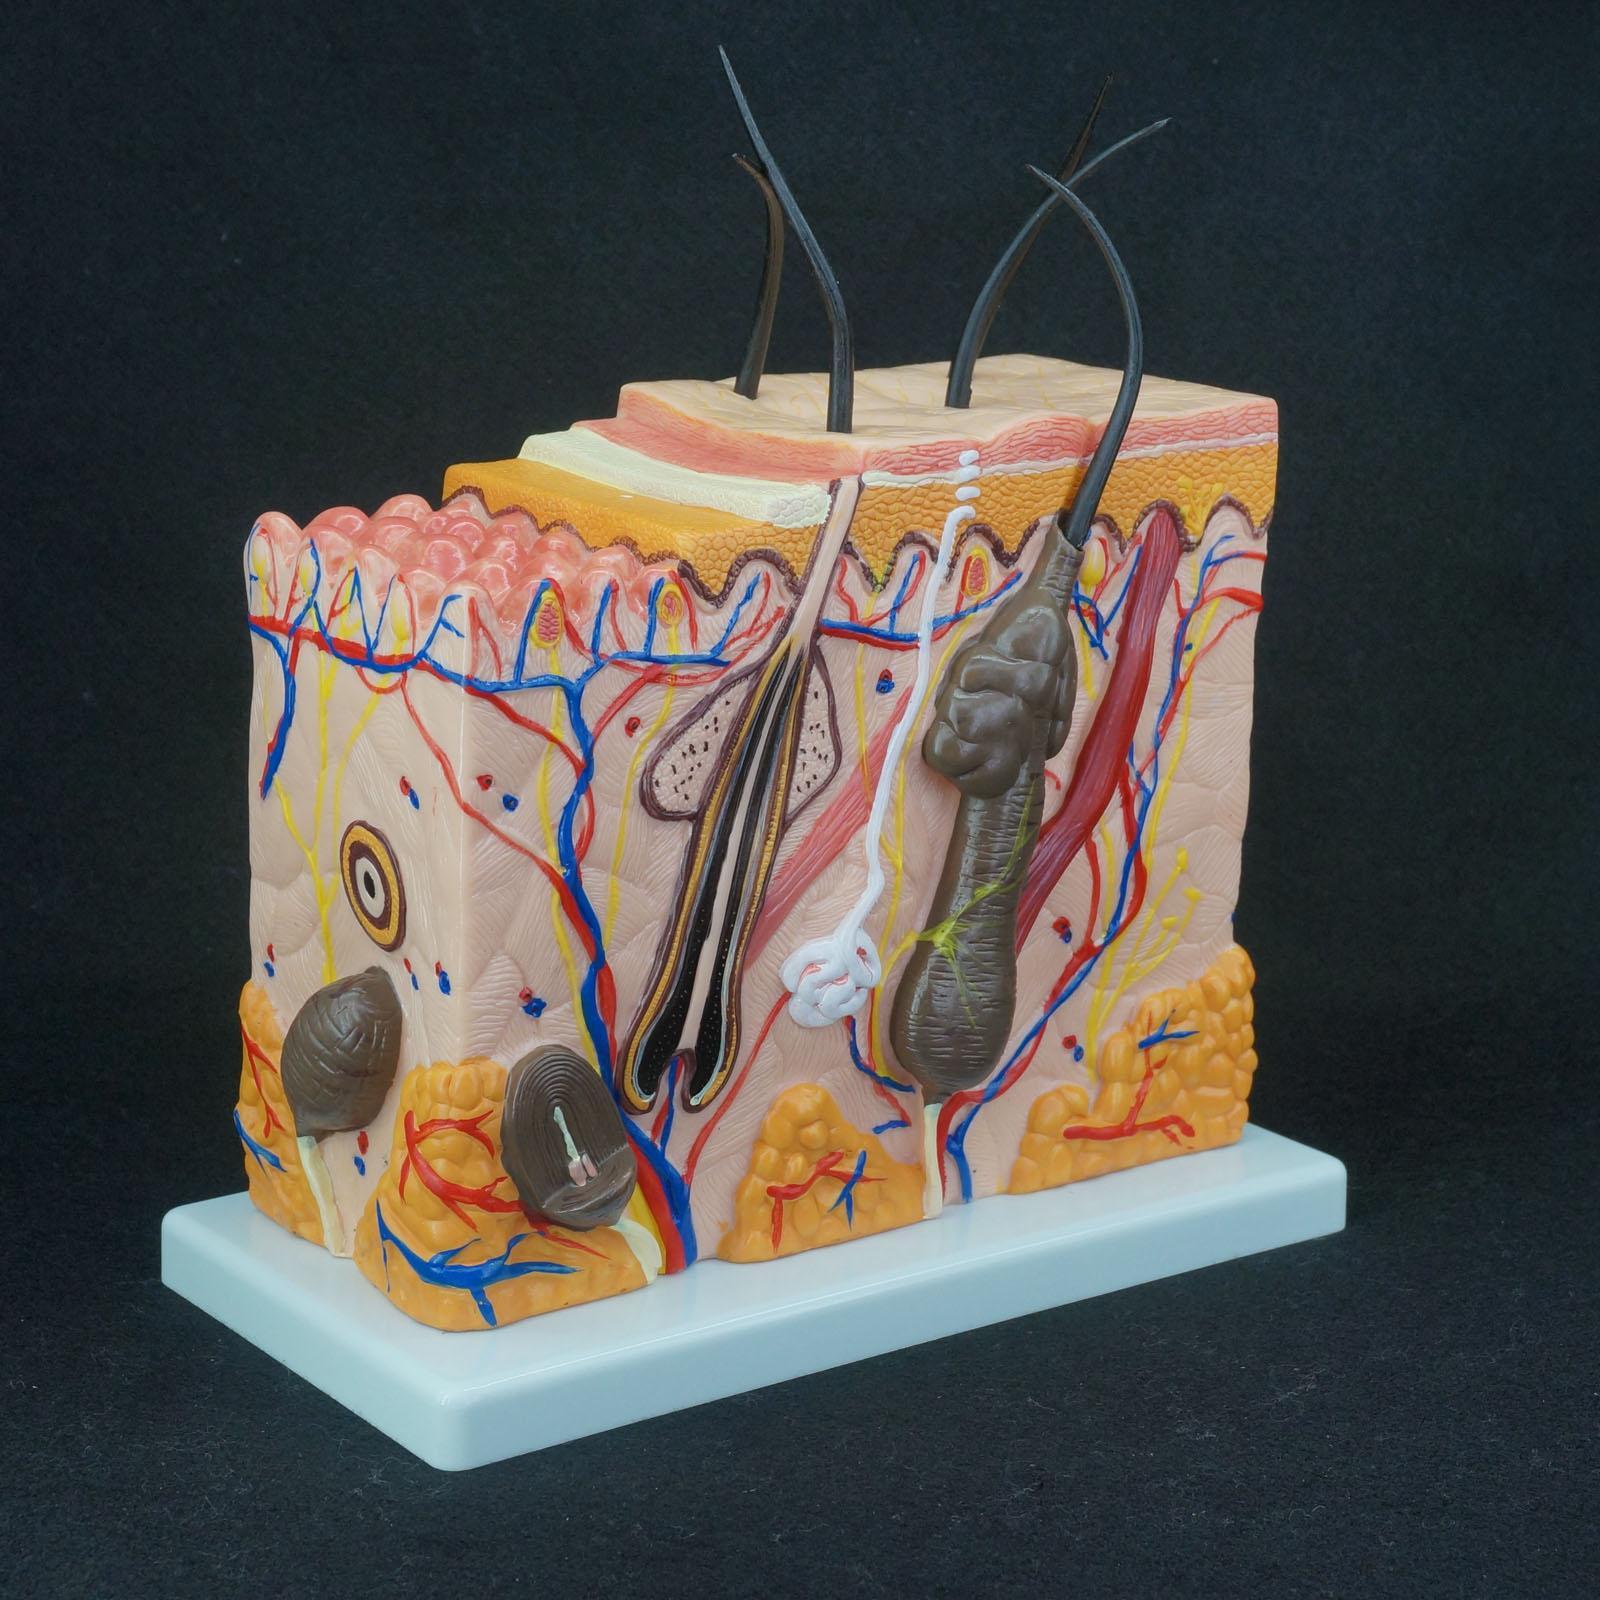 70X tamaño real anatómico piel humana bloque Modelo dermatología médica anatomía